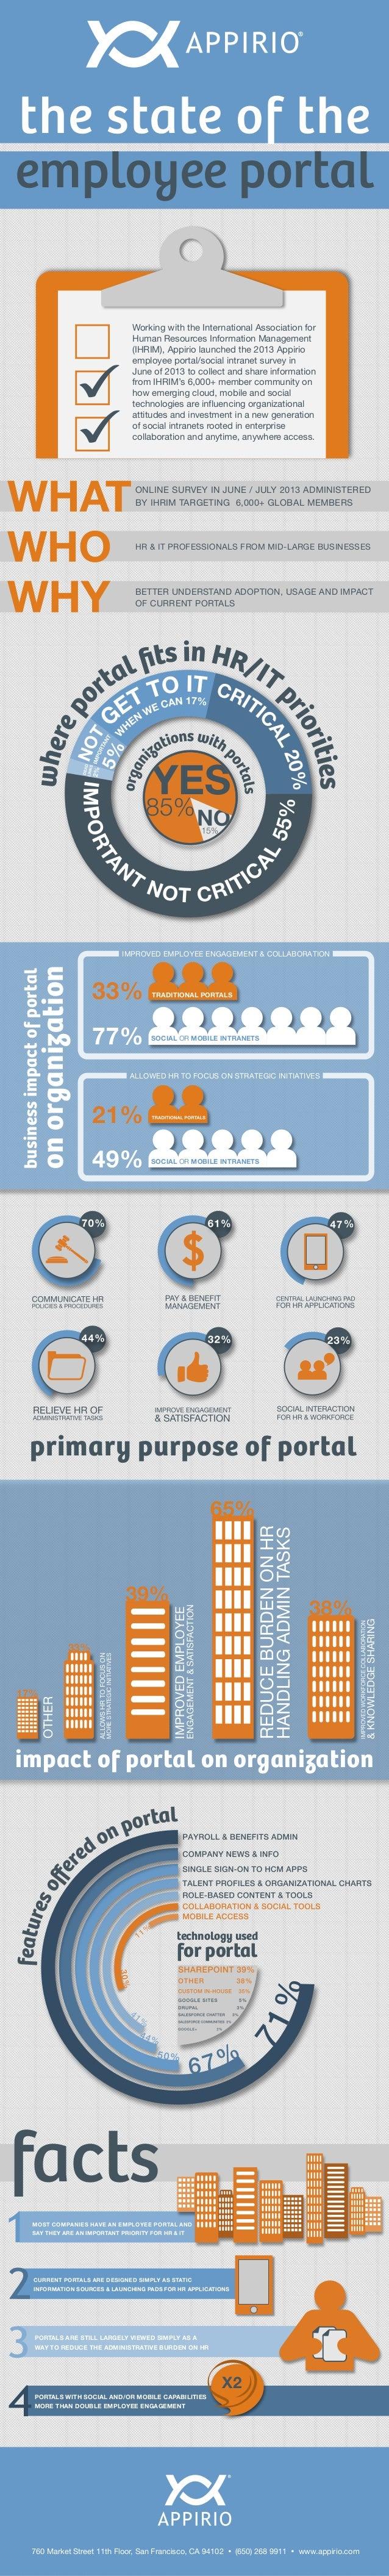 primary purpose of portal ONLINE SURVEY IN JUNE / JULY 2013 ADMINISTERED BY IHRIM TARGETING 6,000+ GLOBAL MEMBERS HR & IT ...